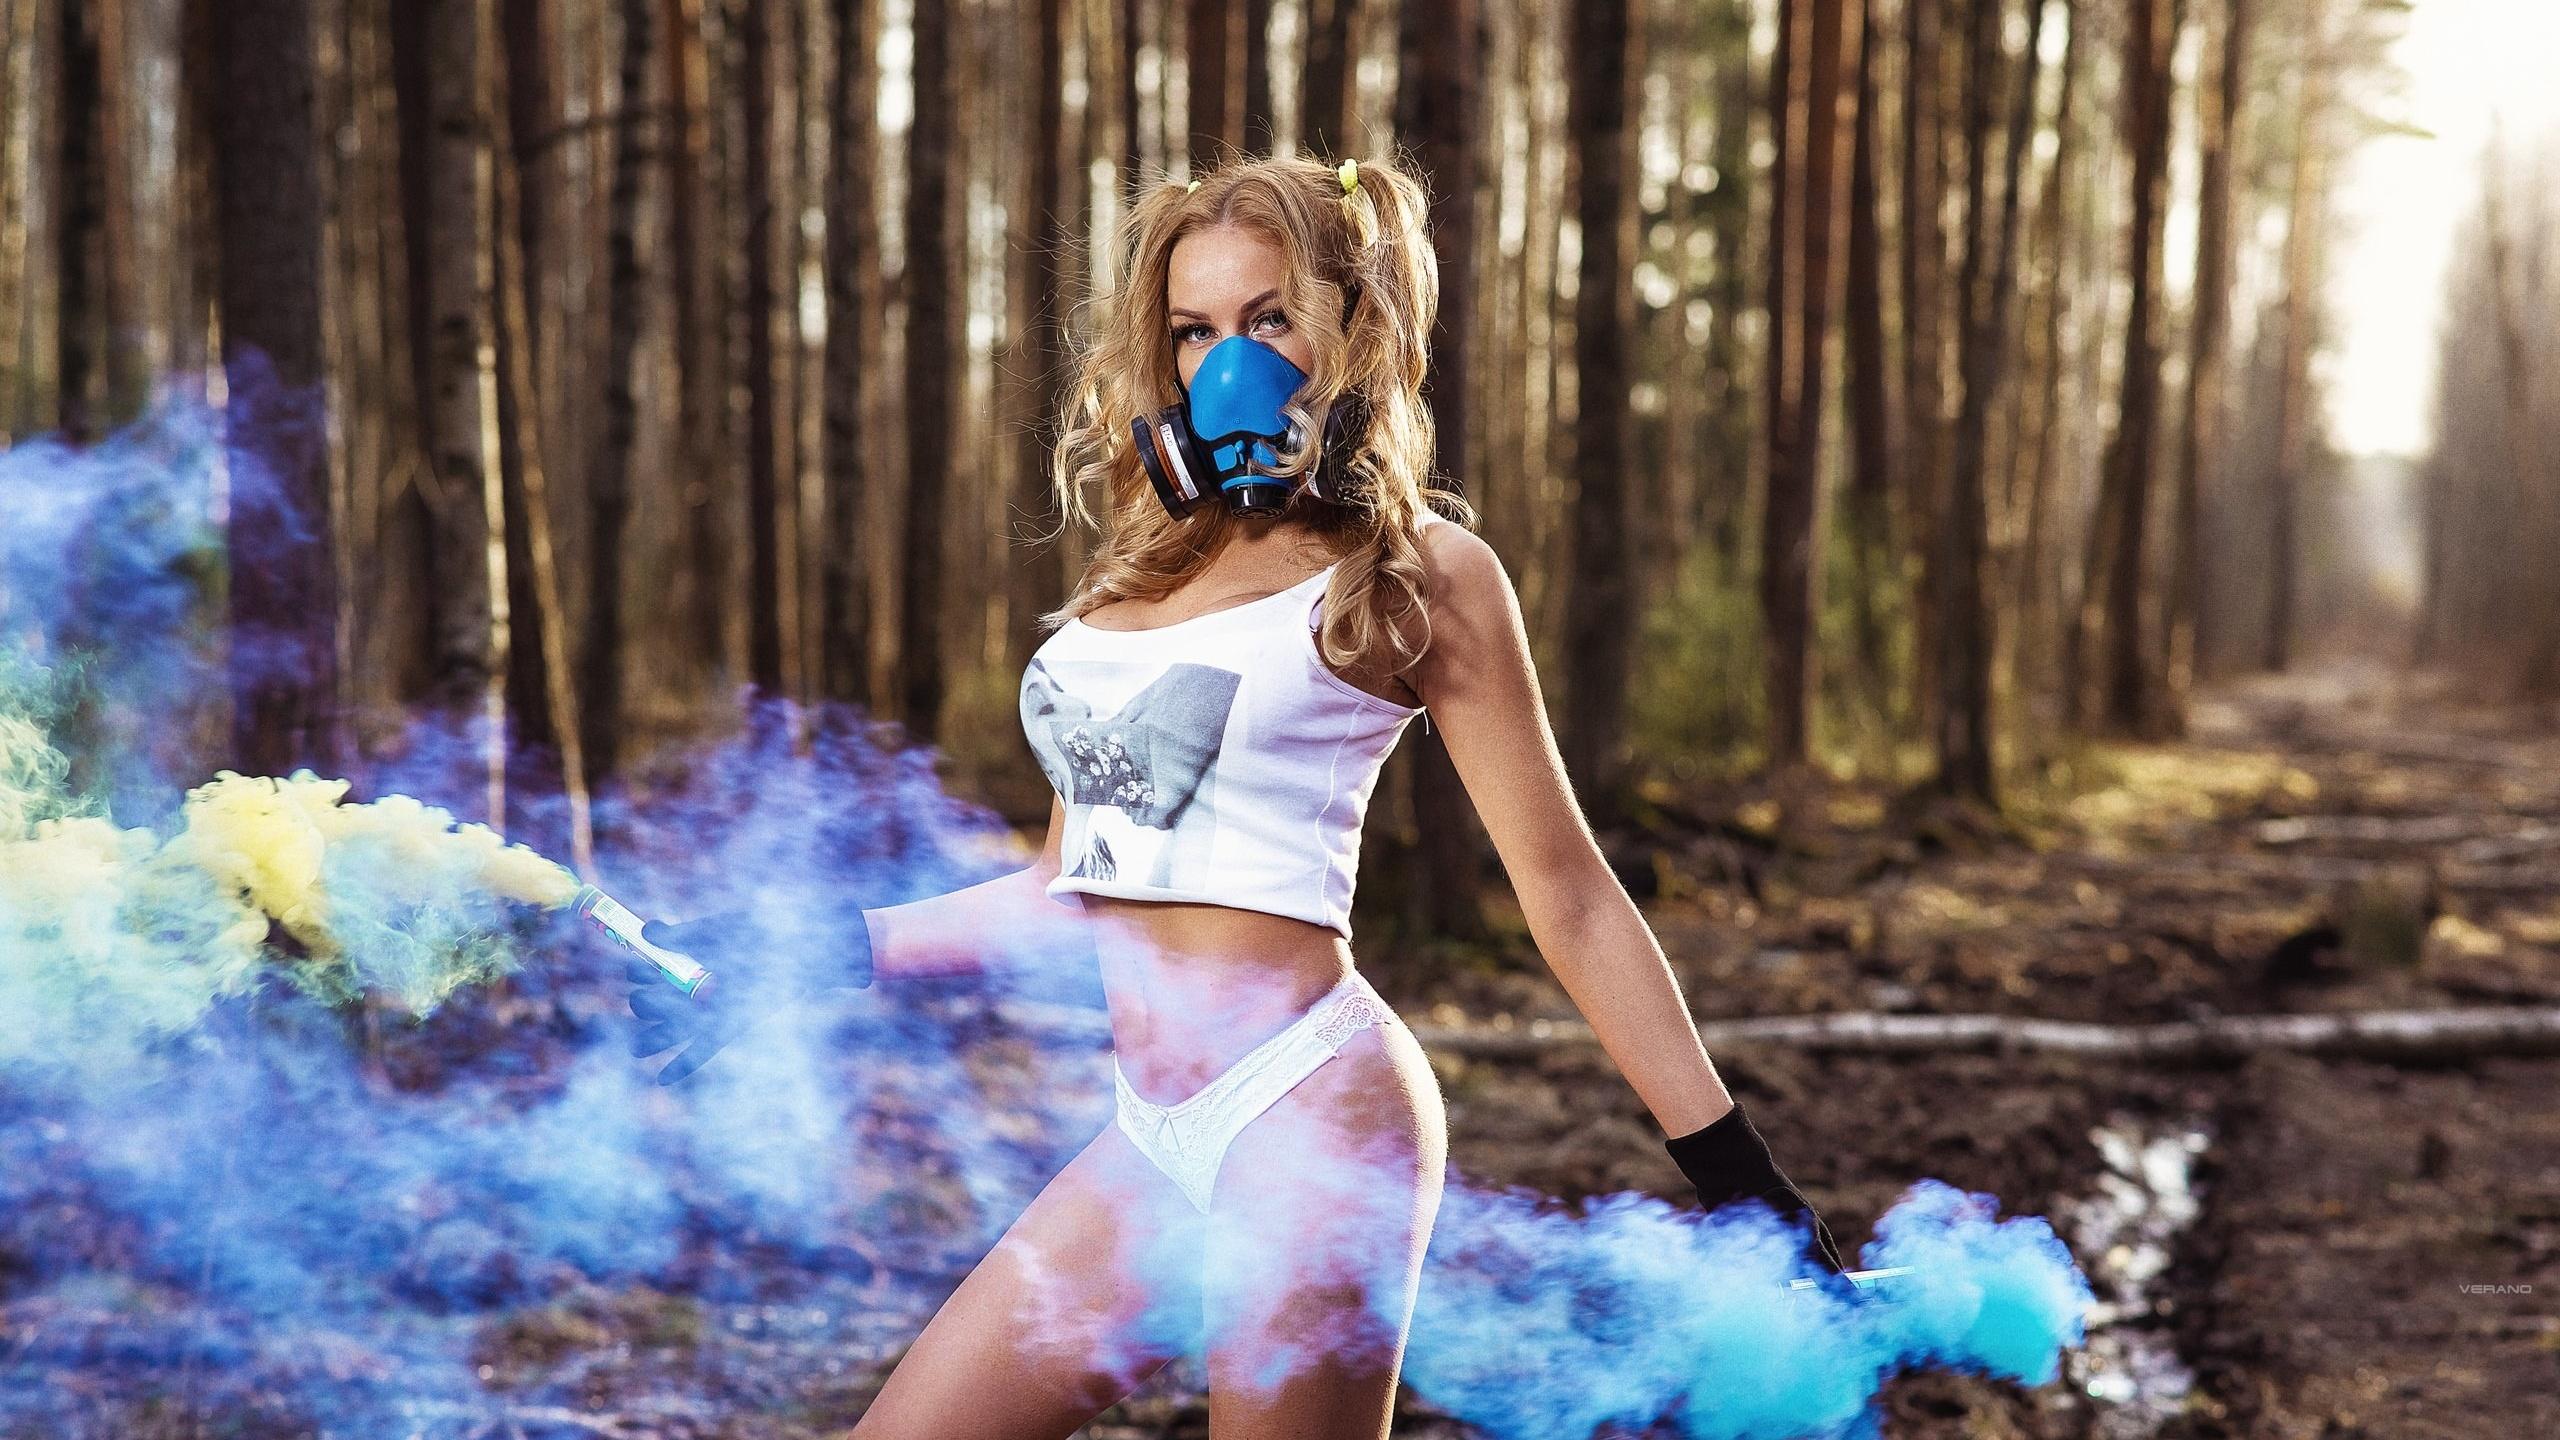 women, gas masks, trees, white panties, smoke, forest, women outdoors, nikolas verano, pigtails, tank top, brunette, belly, gloves